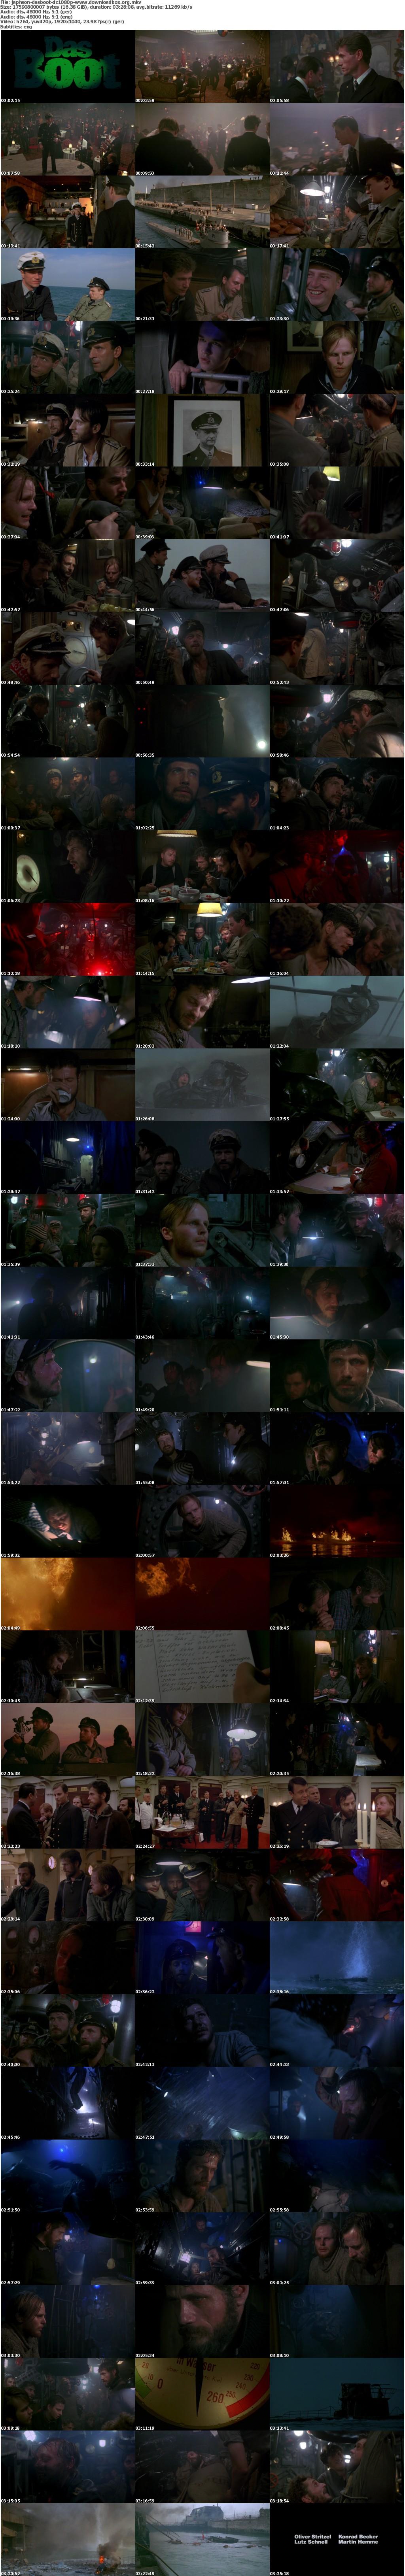 Das Boot 1981 The Directors Cut 1080p BluRay x264-Japhson